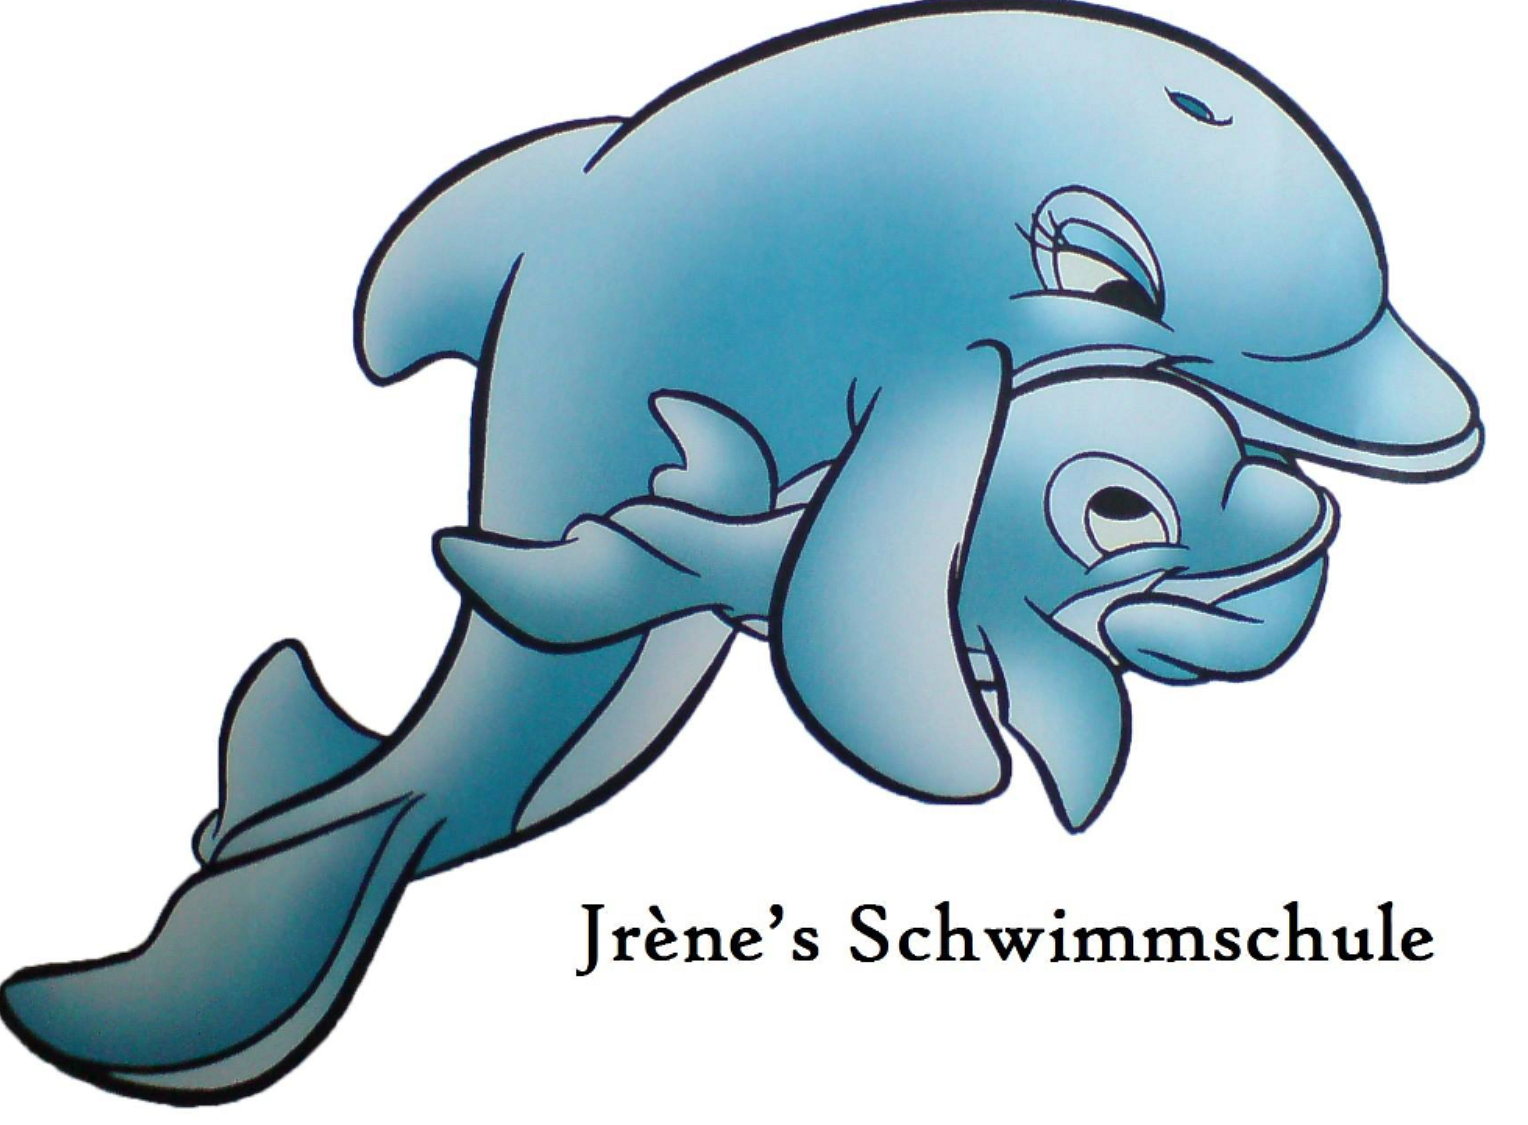 Jrène's Schwimmschule